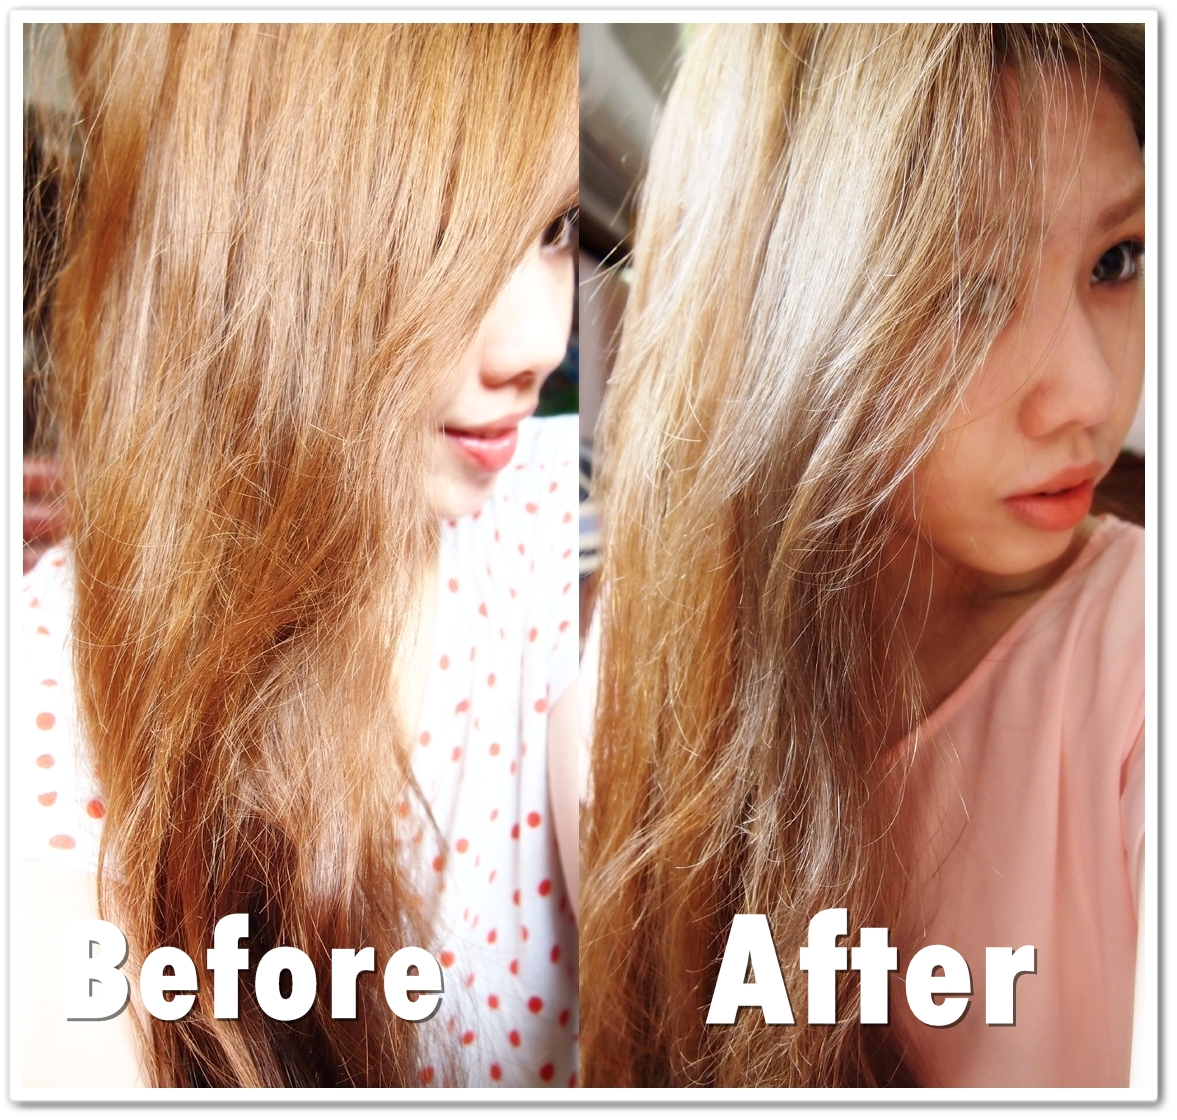 Journey on beauty schwarzkopf berry ash foam color review nvjuhfo Images